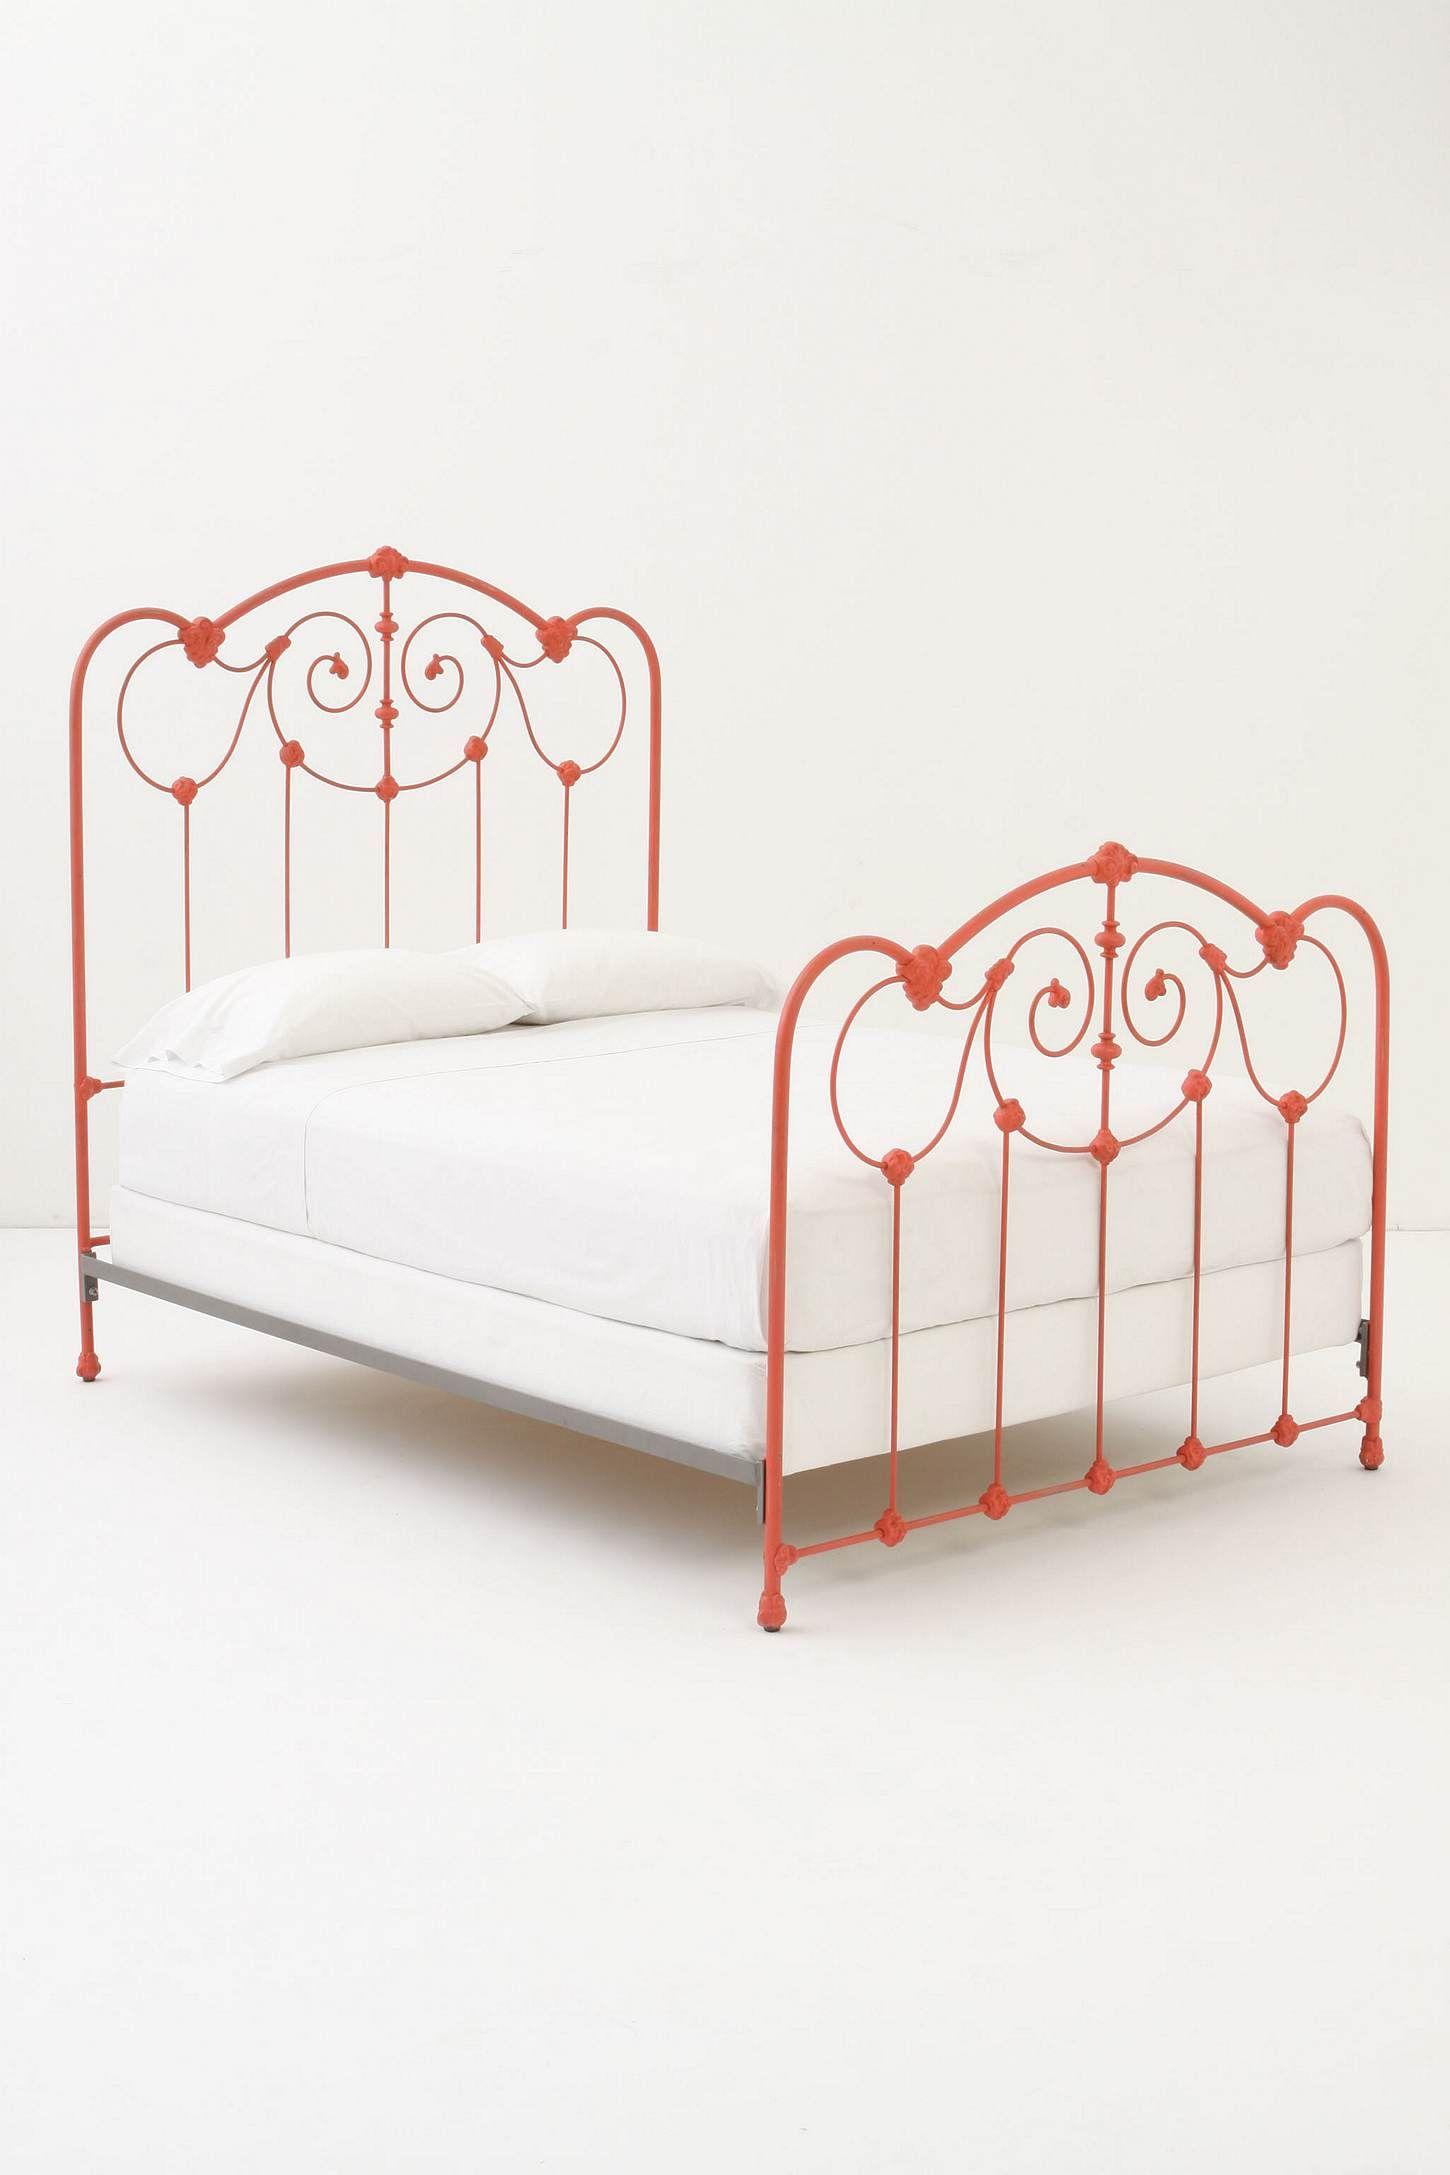 Hanging bed anthropologie - Anthropologie